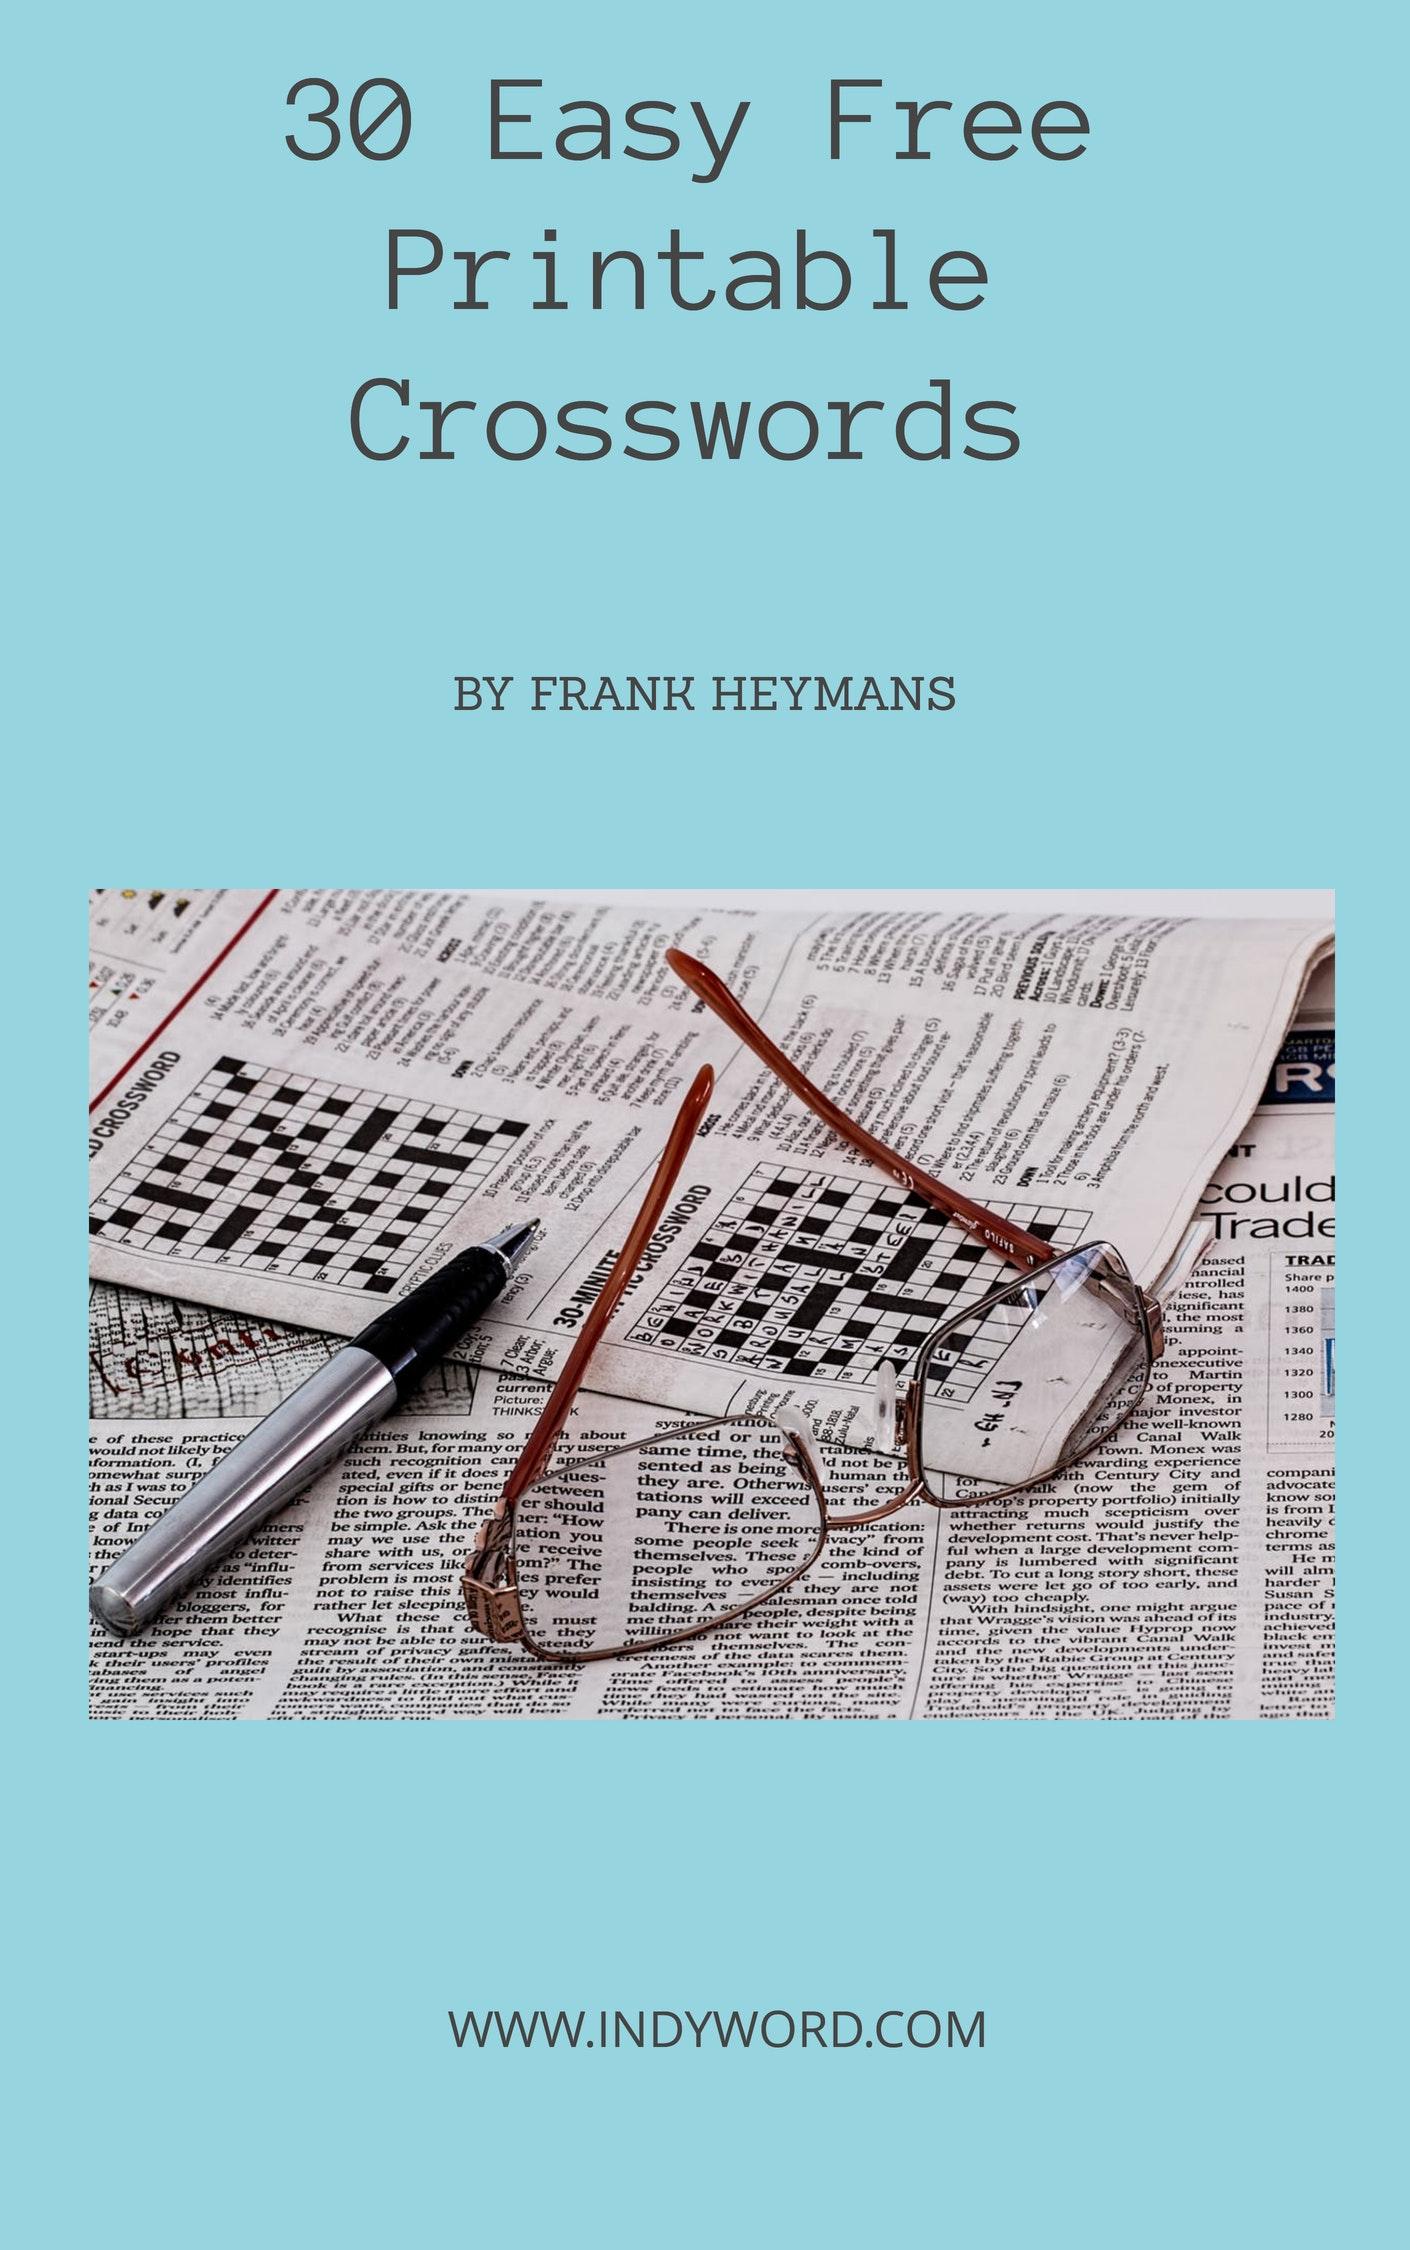 Easy Crossword Puzzles Printable - Printable Crossword Book